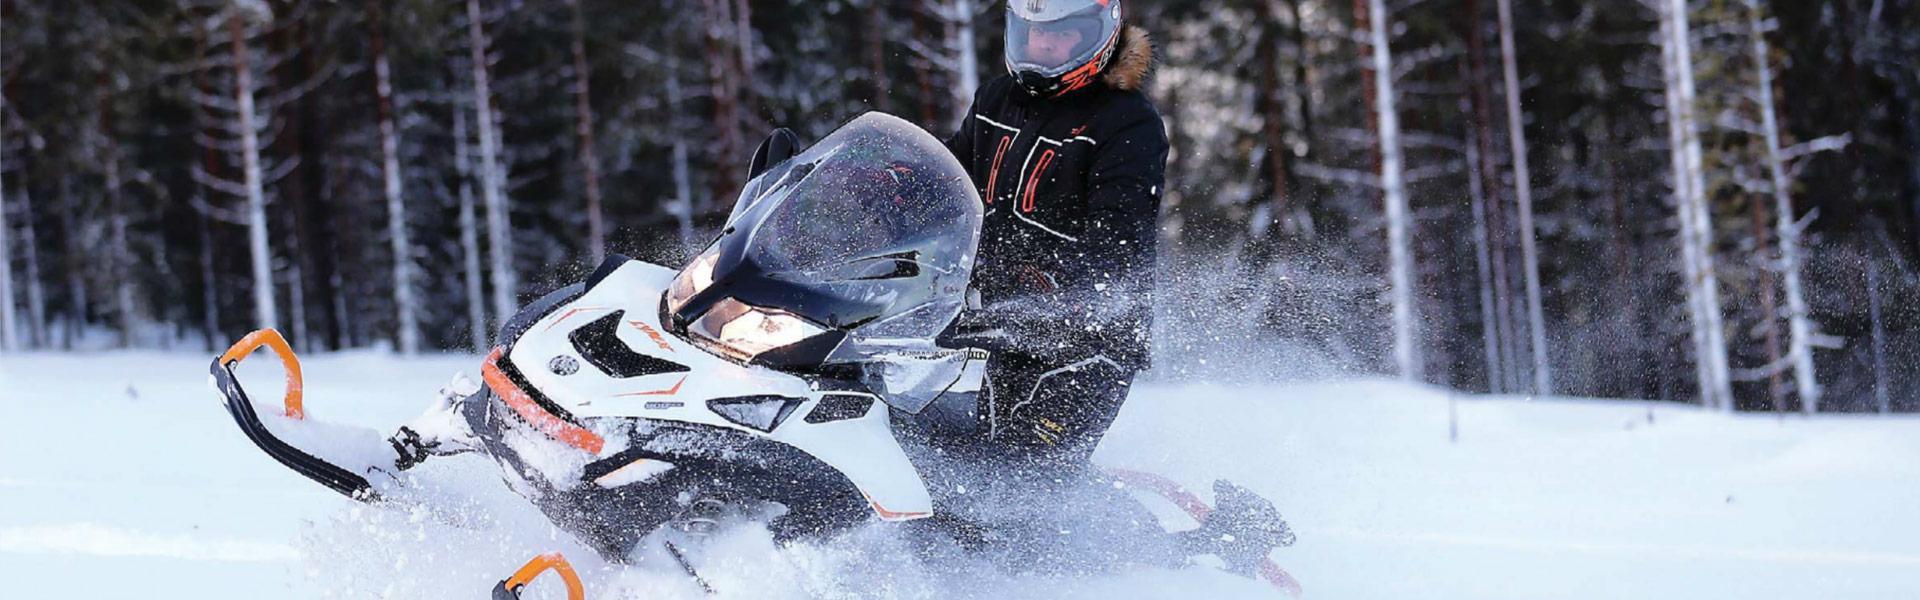 on-Snow_Lynx